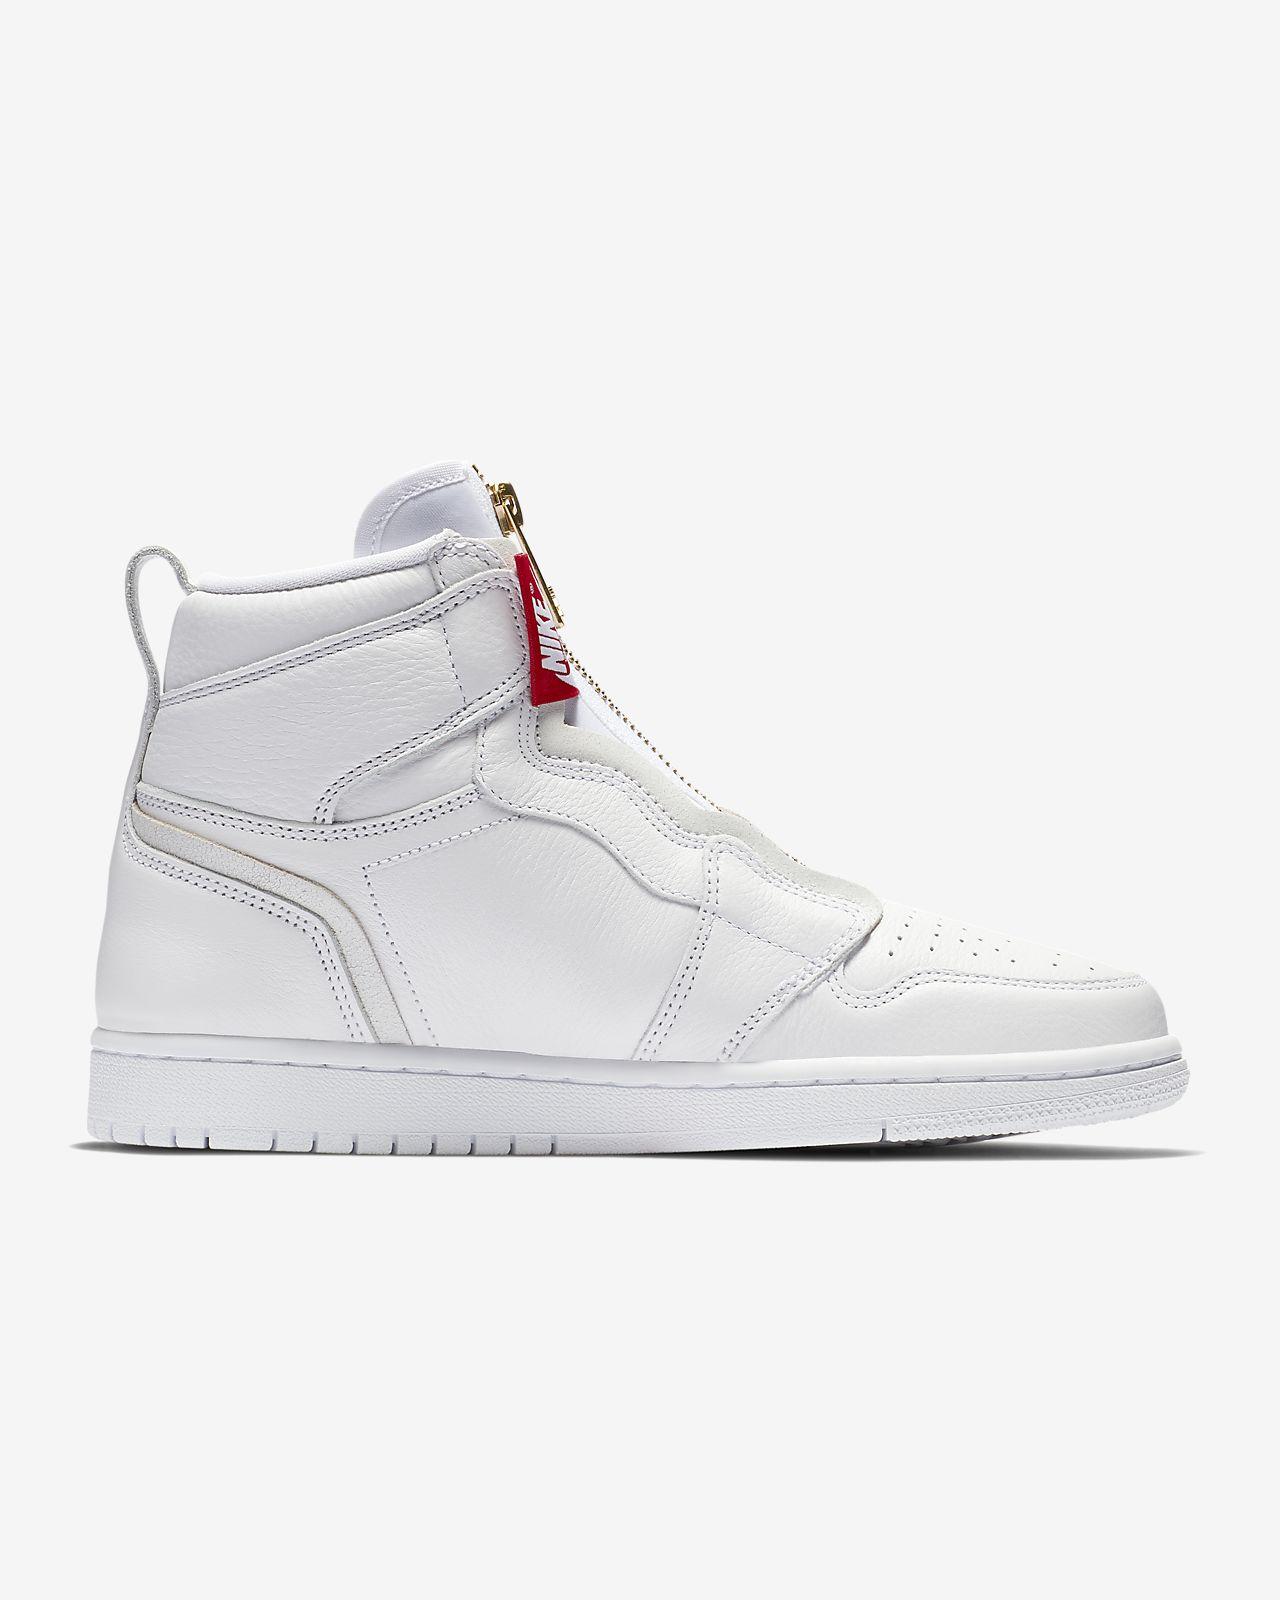 35d94dfb7574 Air Jordan 1 High Zip Women s Shoe. Nike.com MY